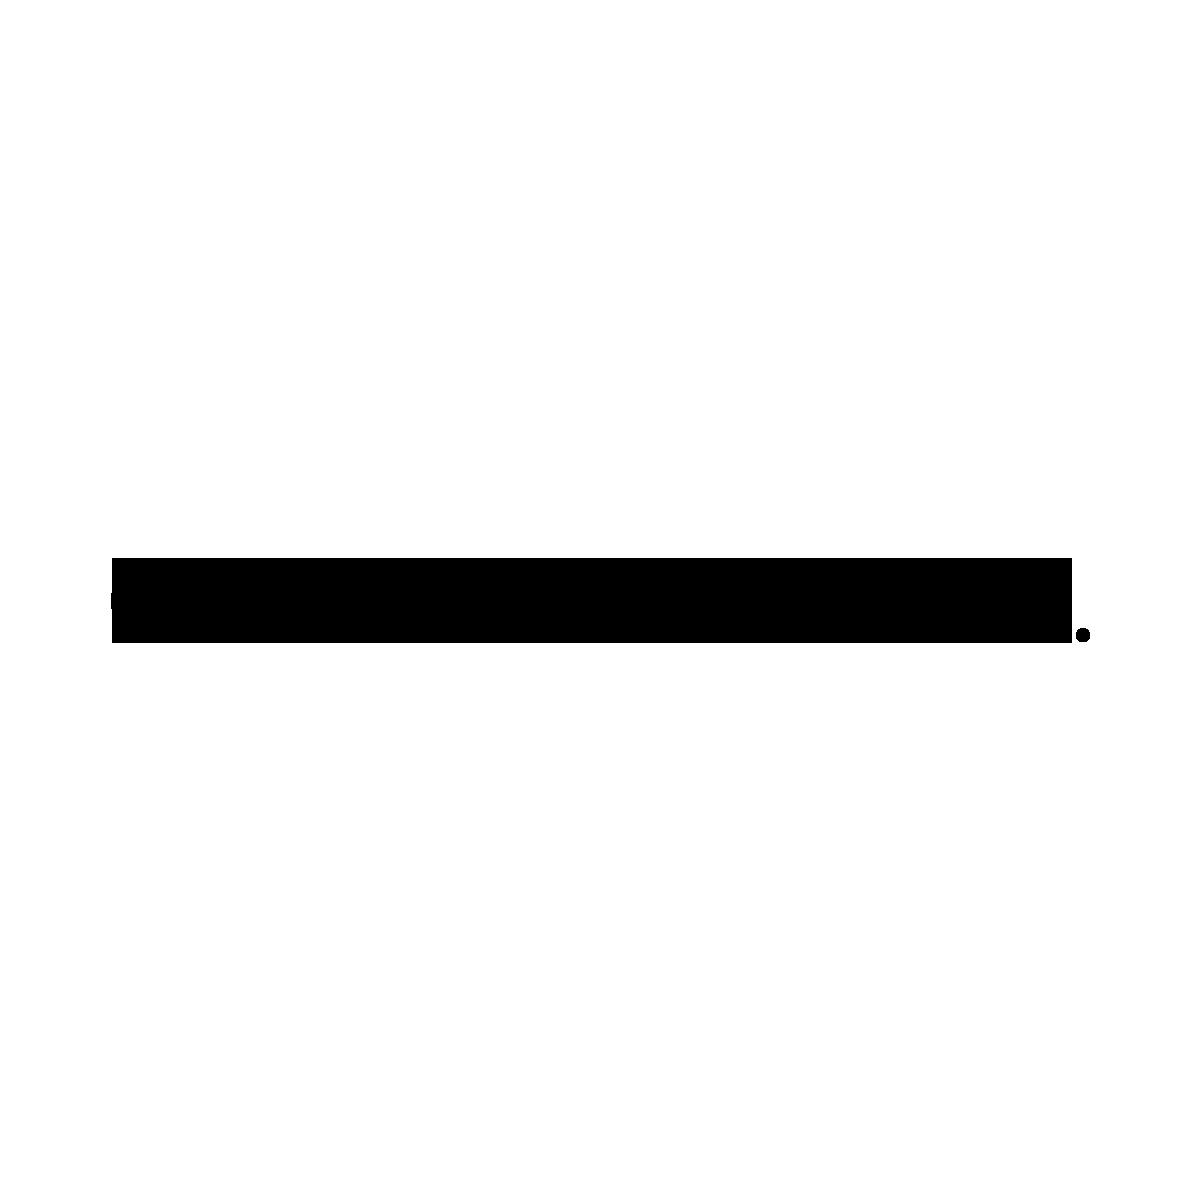 YARA-Sandalette-4CM-zebra-printed-leather-black-beige-